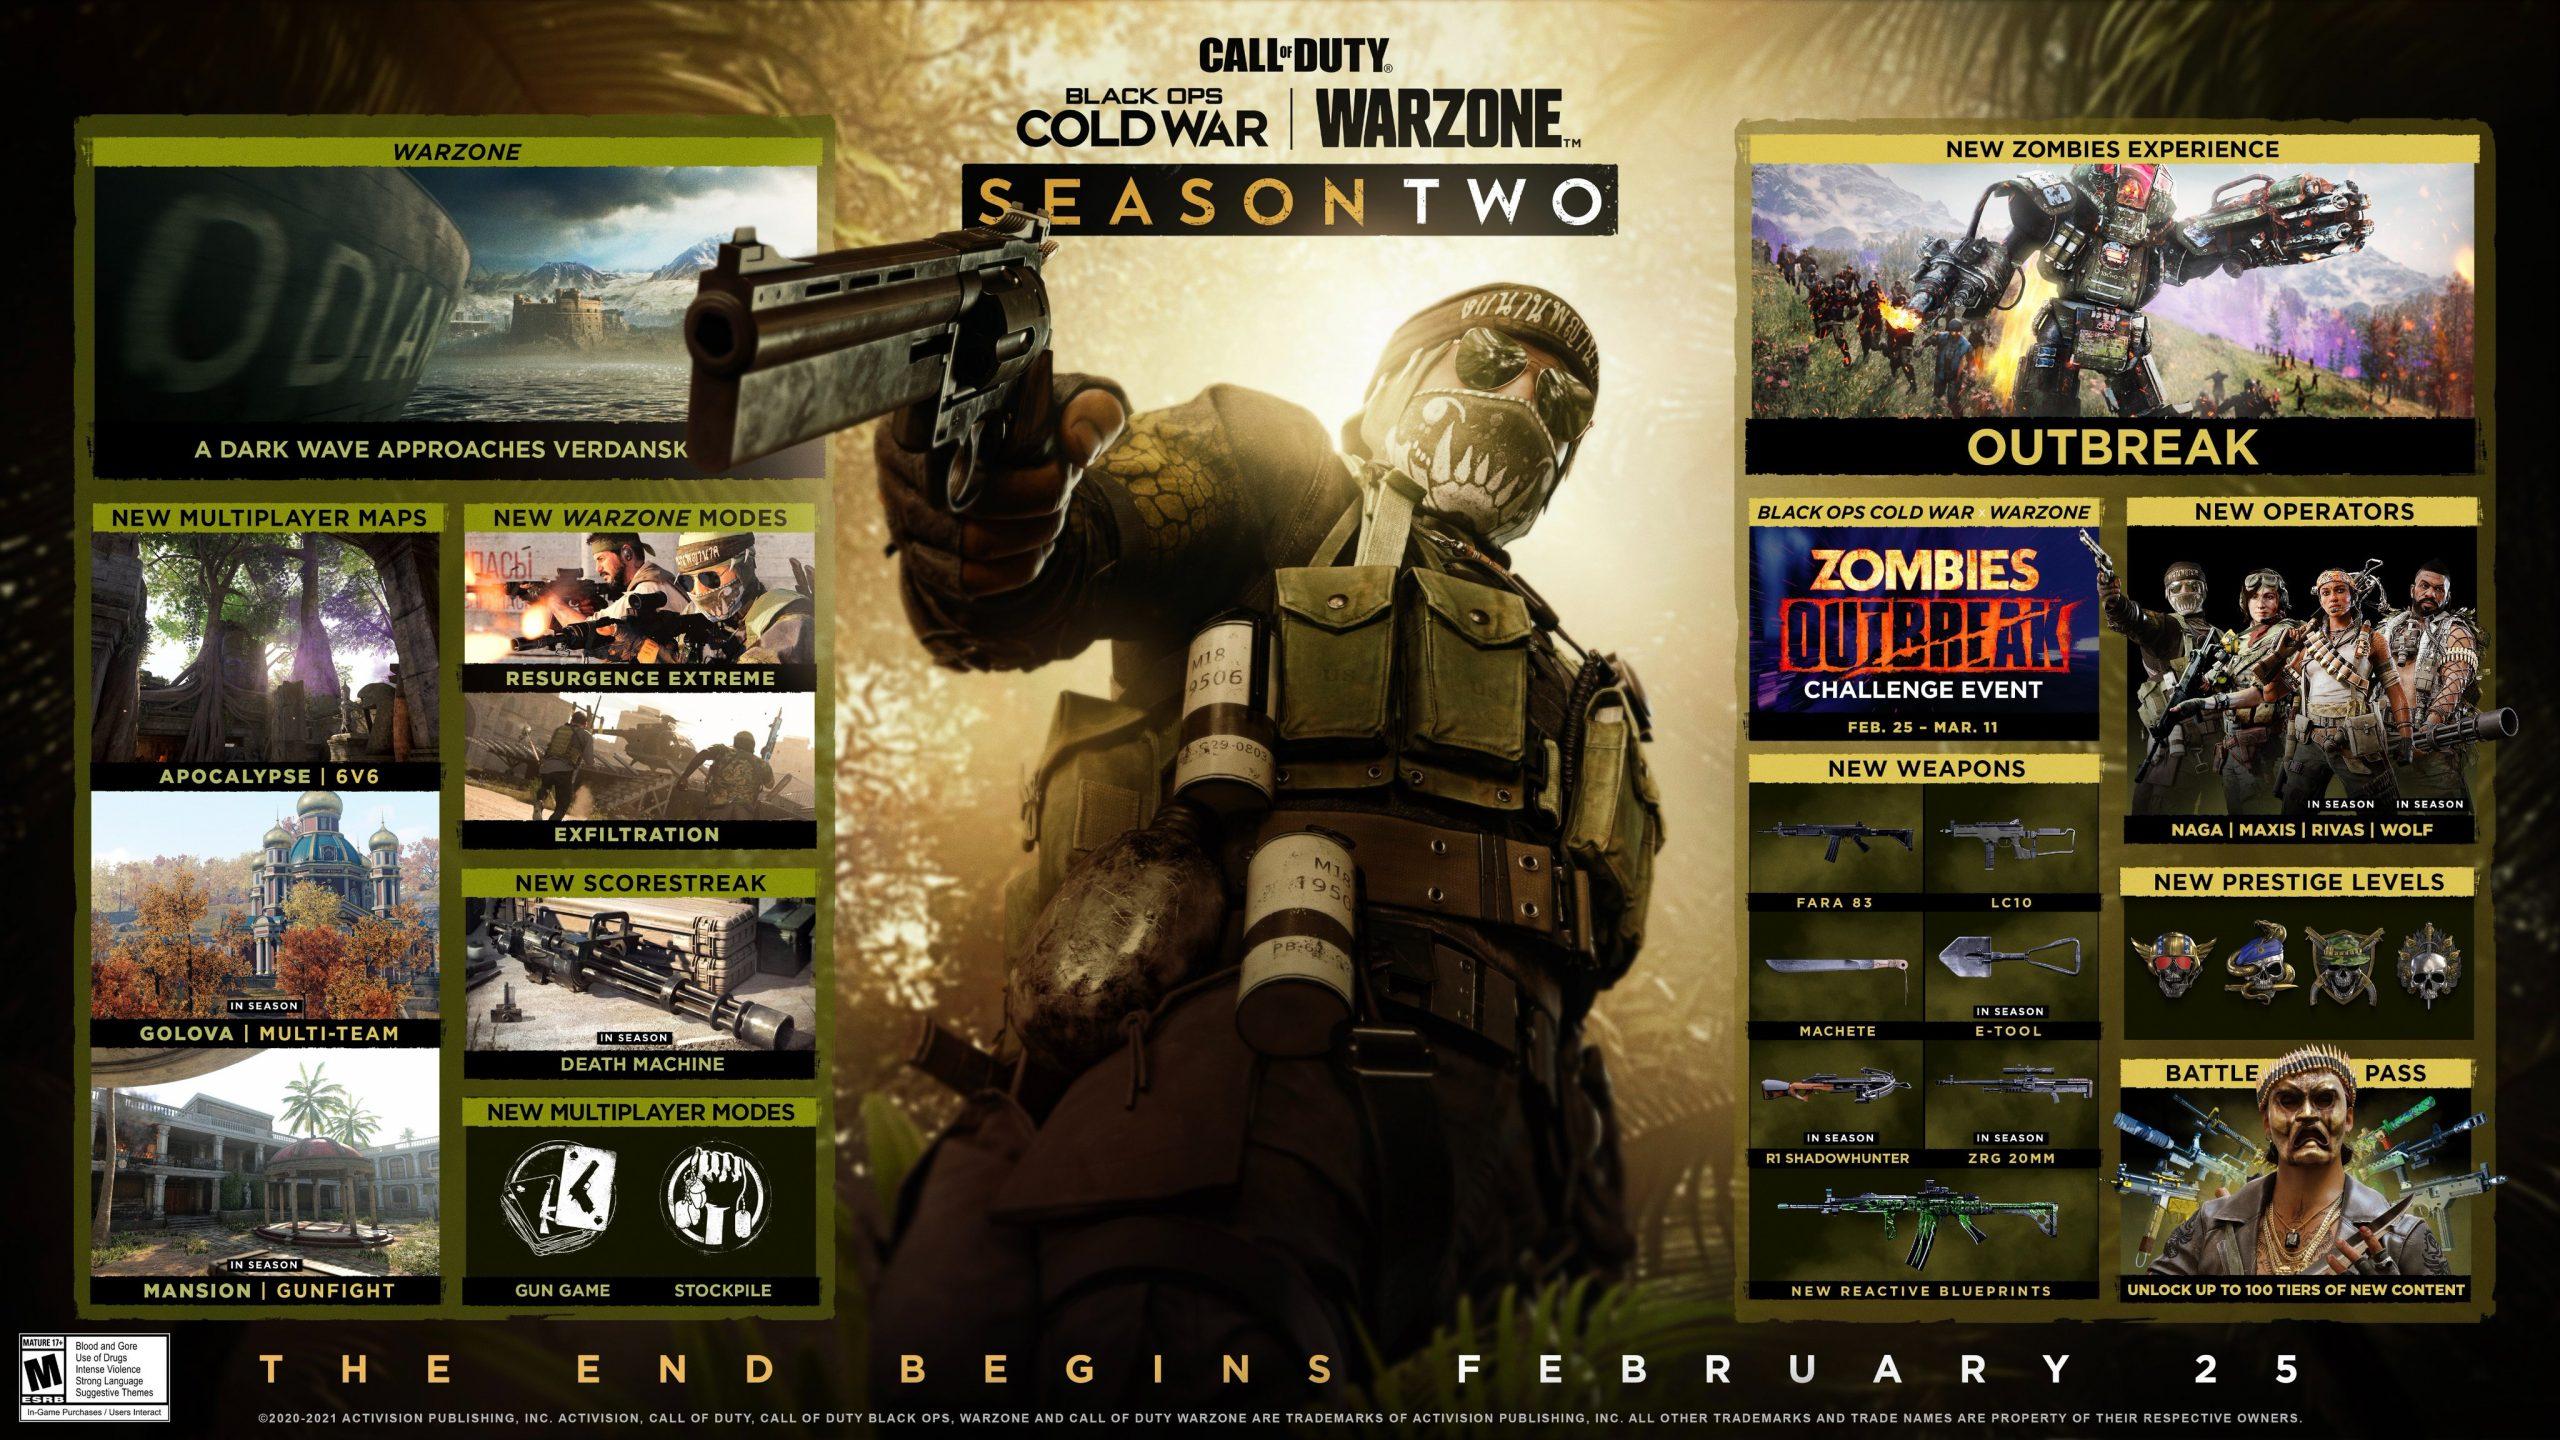 CoD Black Ops Cold War Season Two